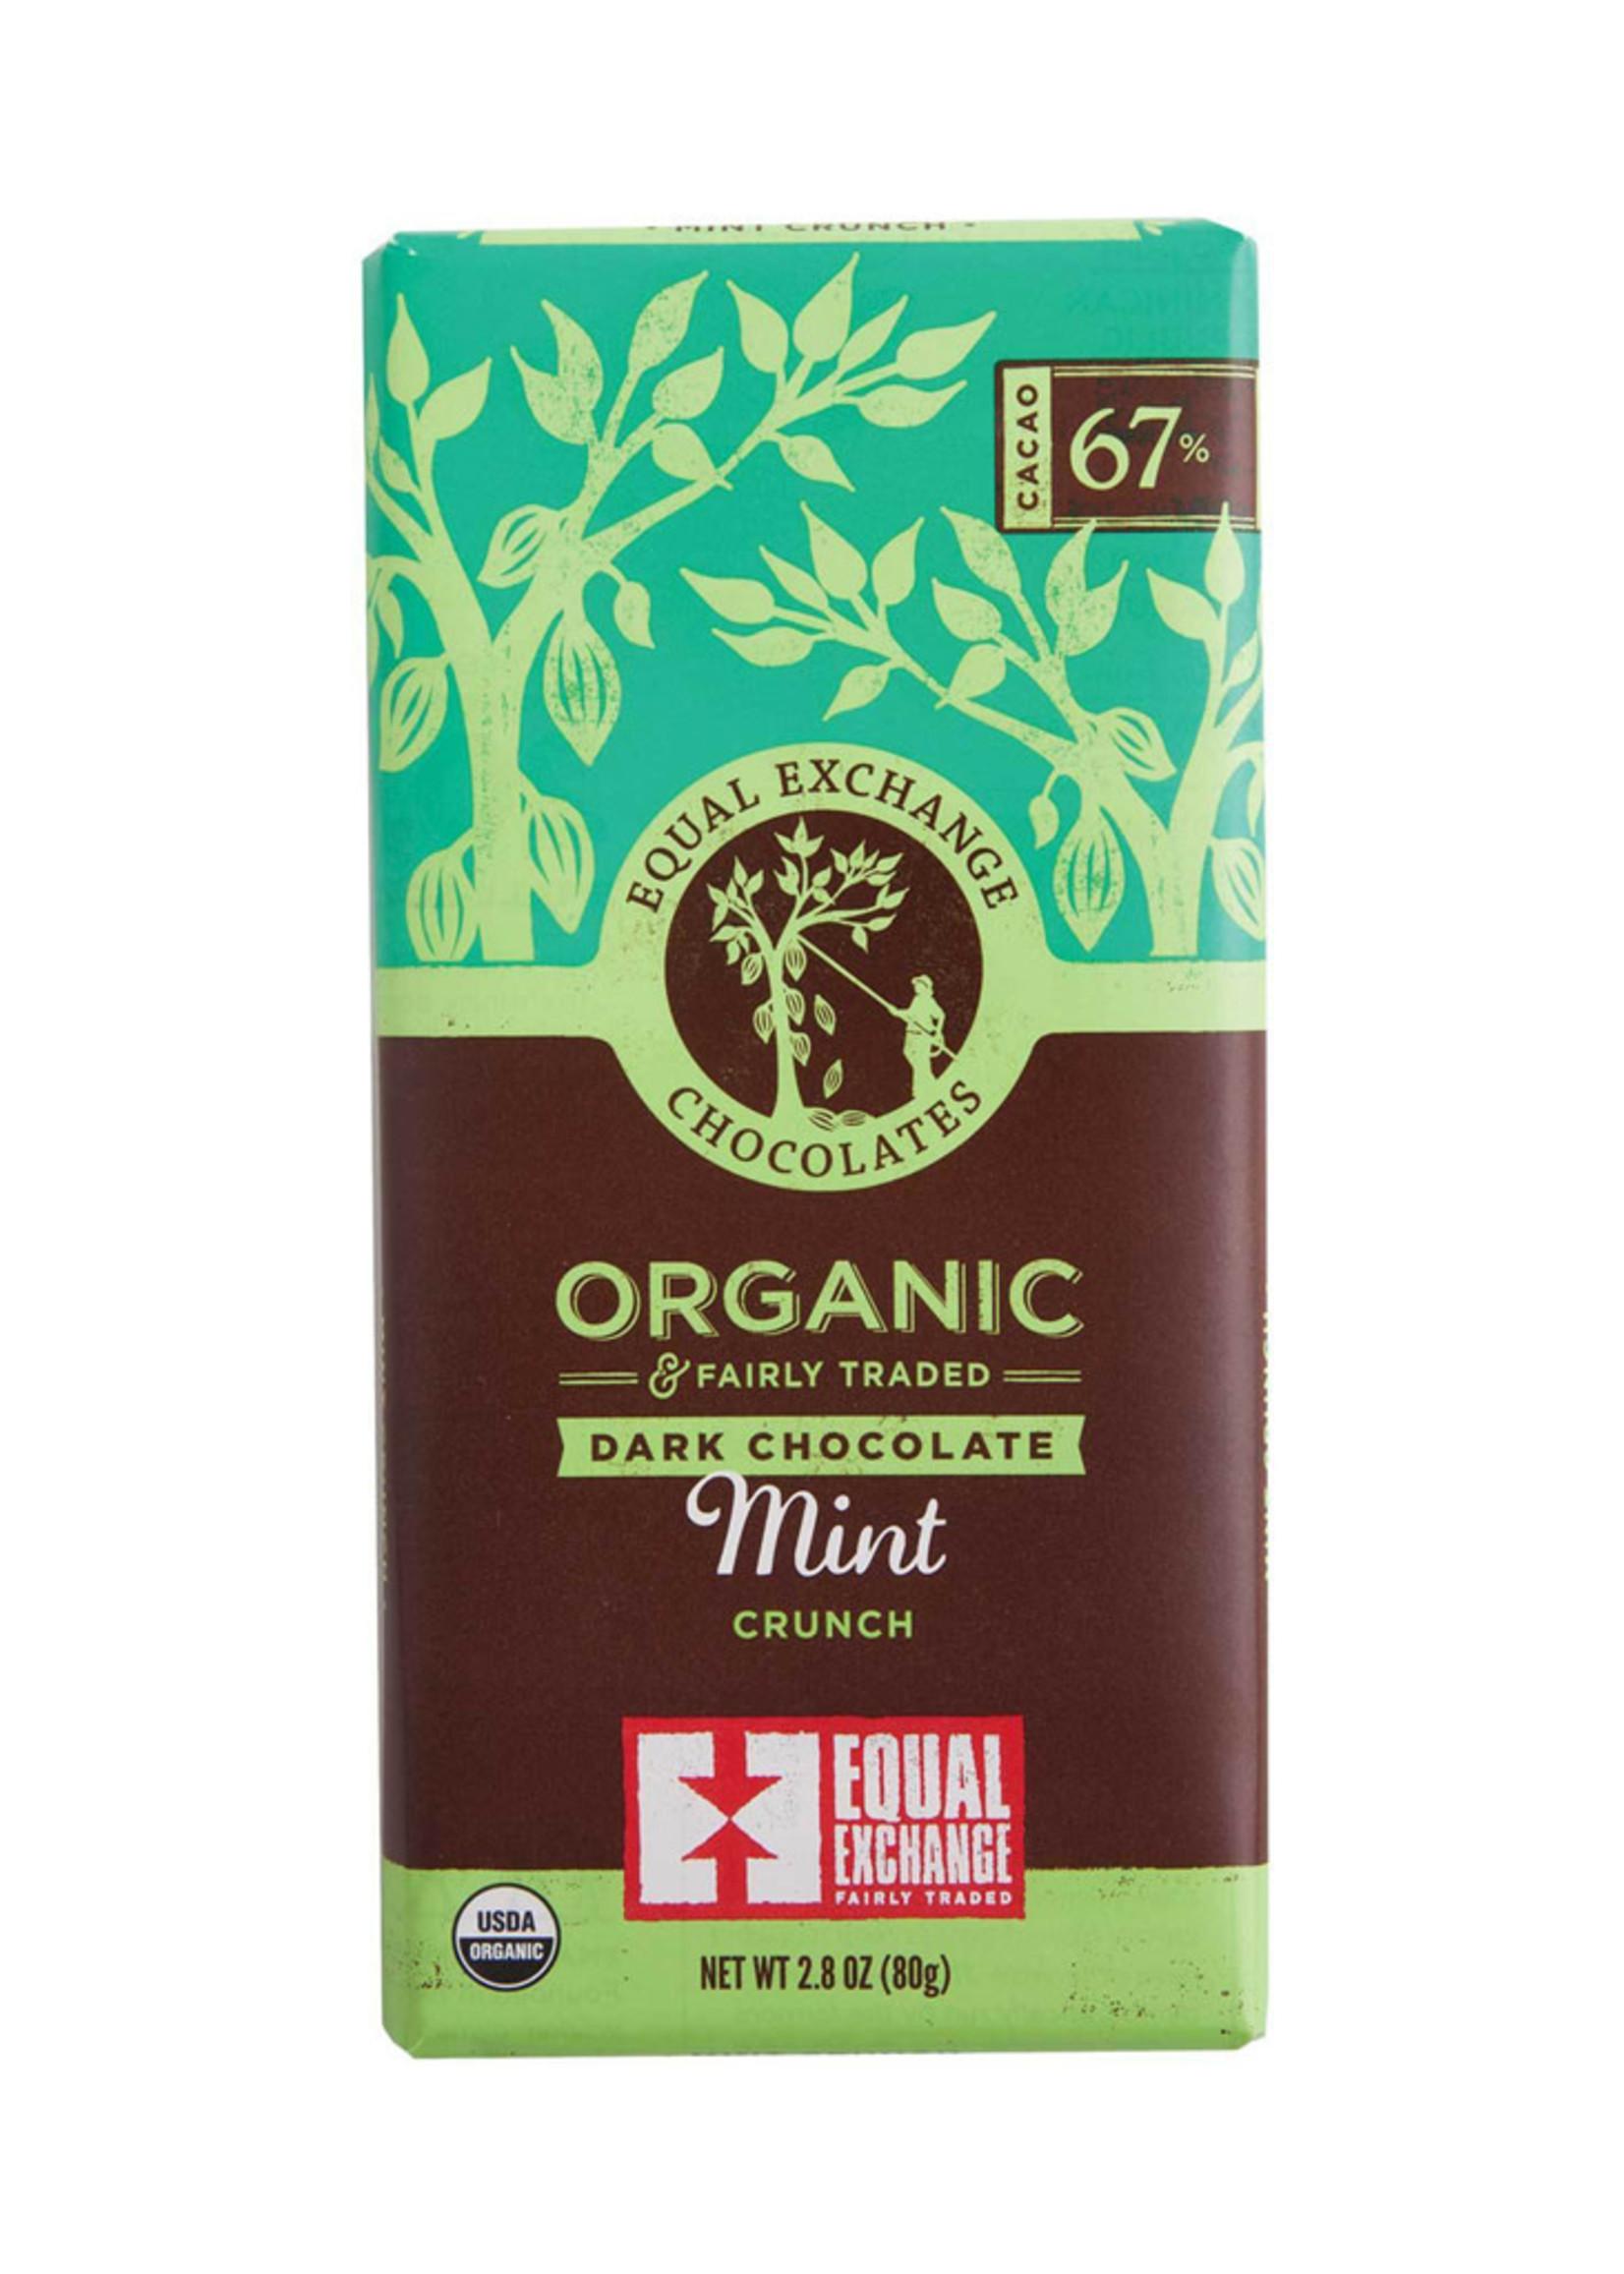 Equal Exchange Dark Chocolate Bar with Mint Crunch